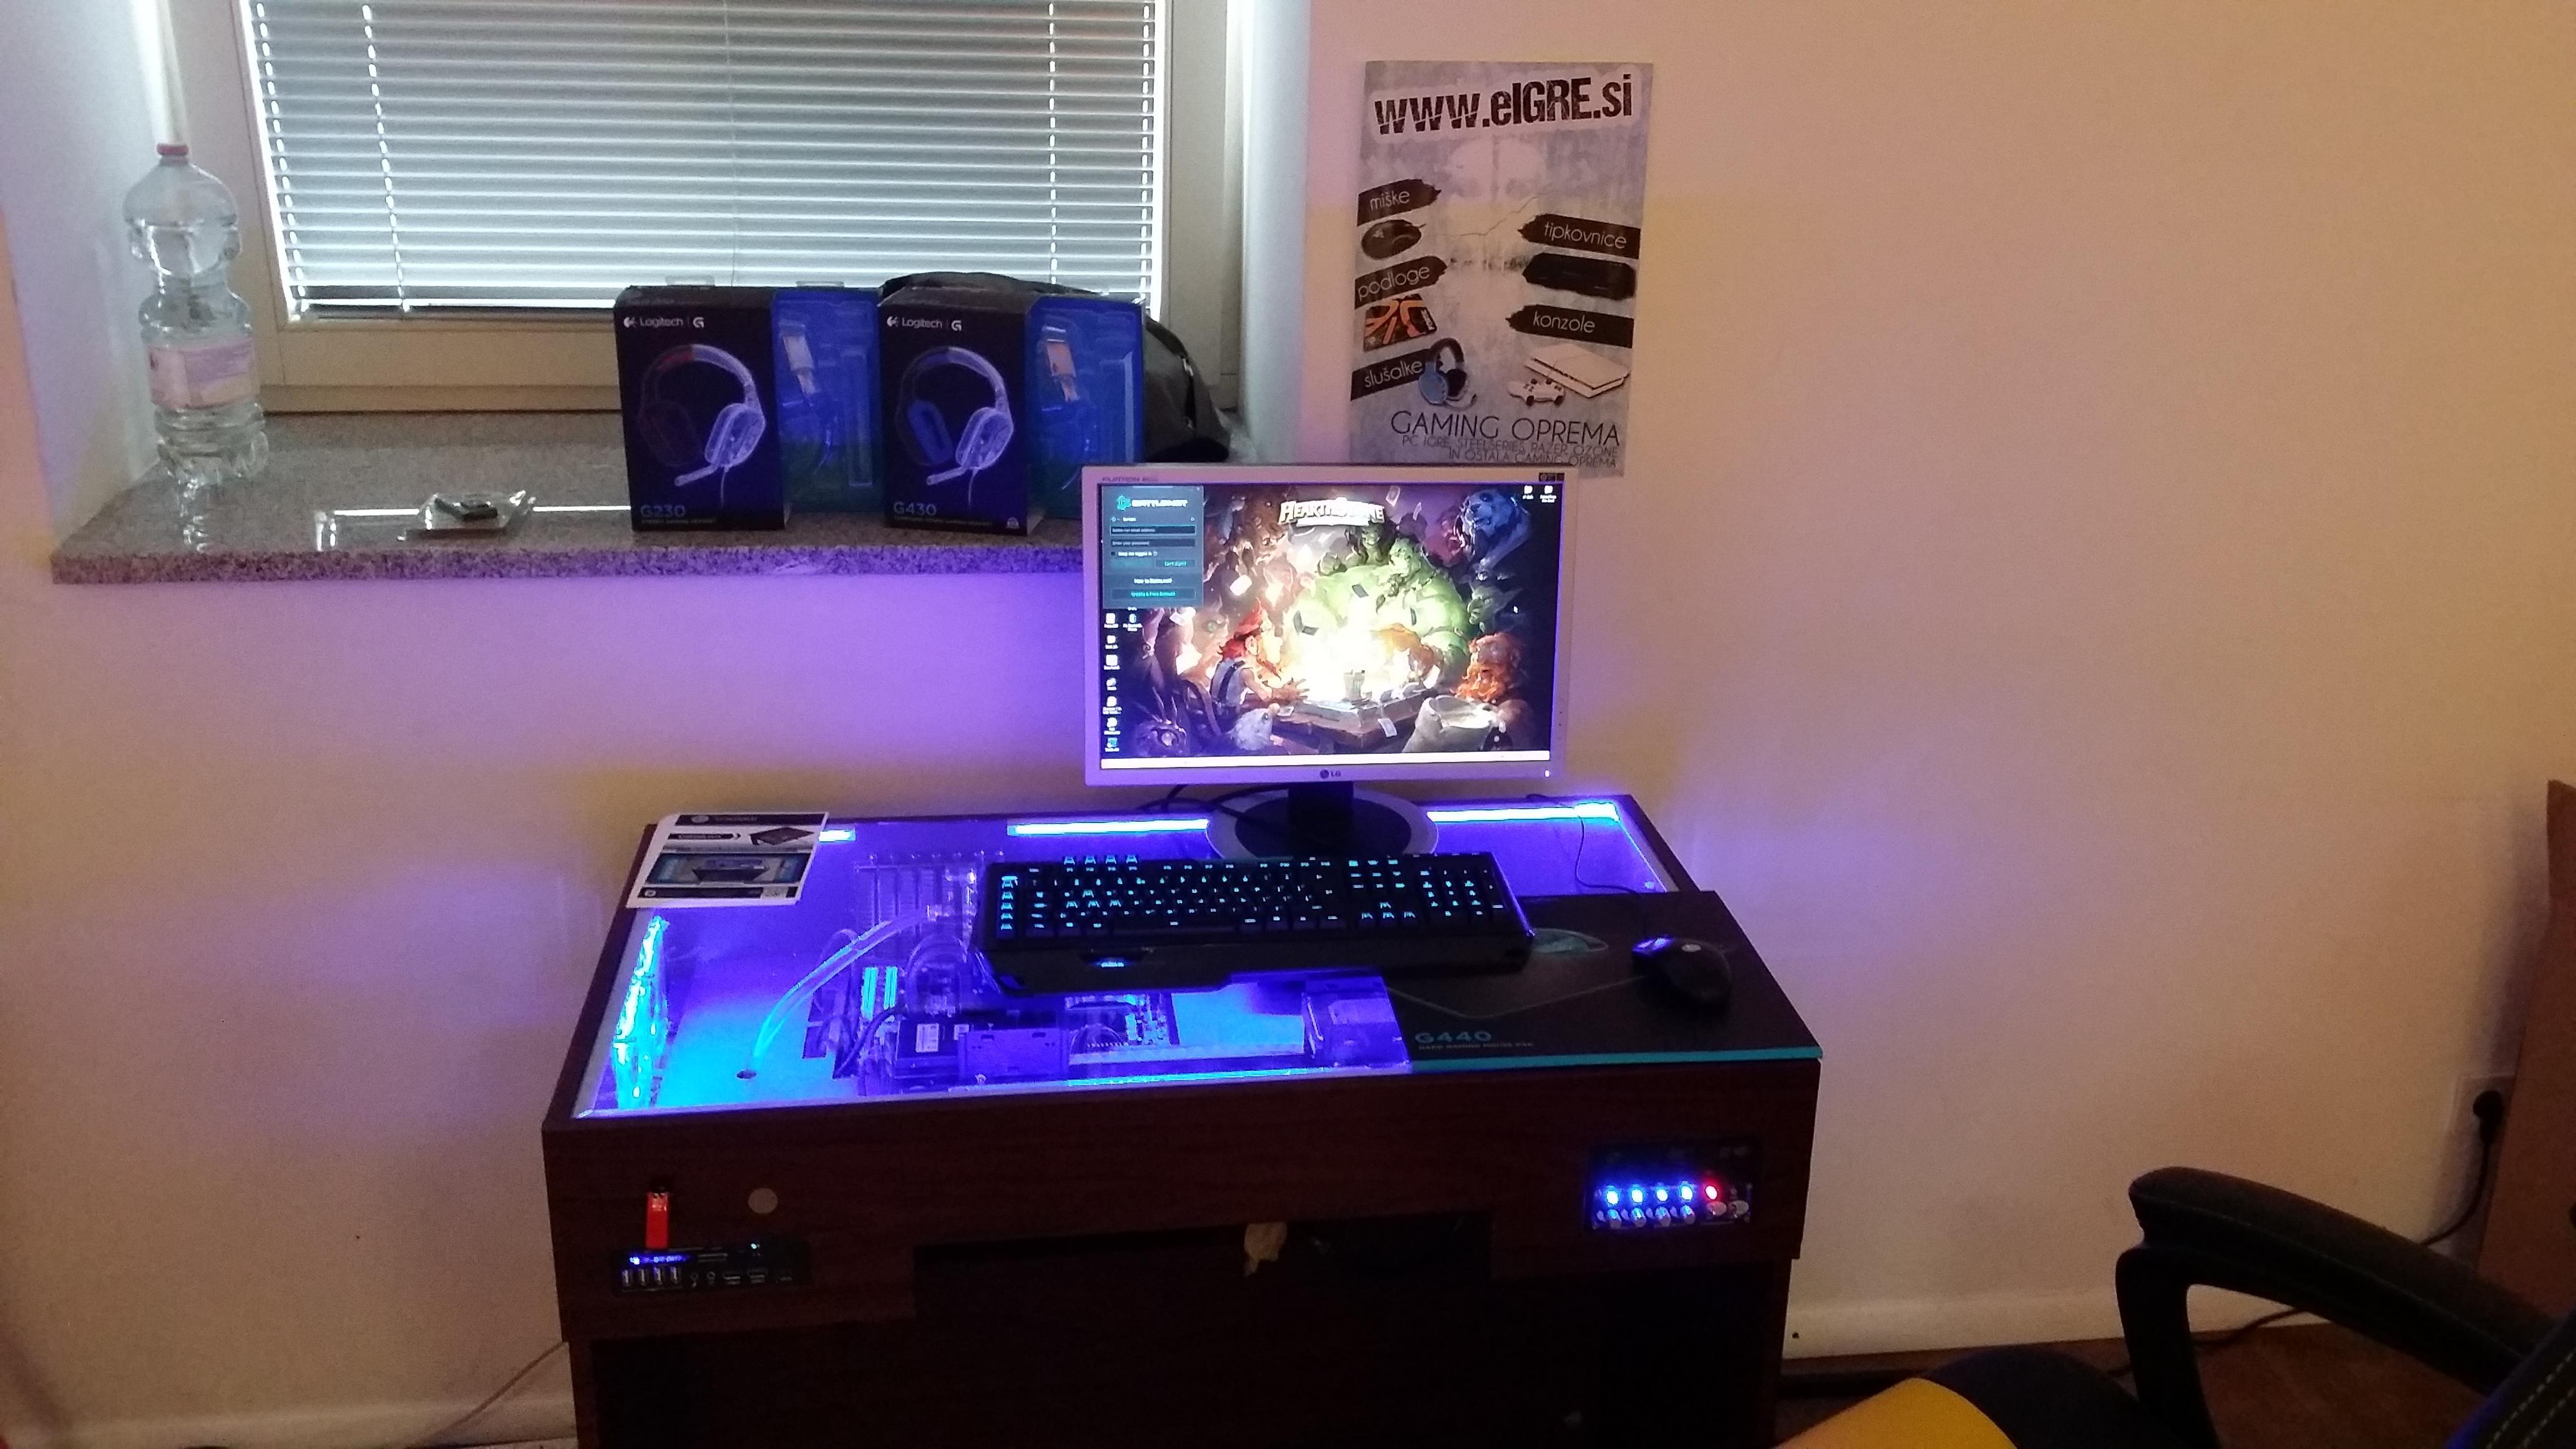 Radioactive LAN 5 - S7 Desk 2014 - By S7 design